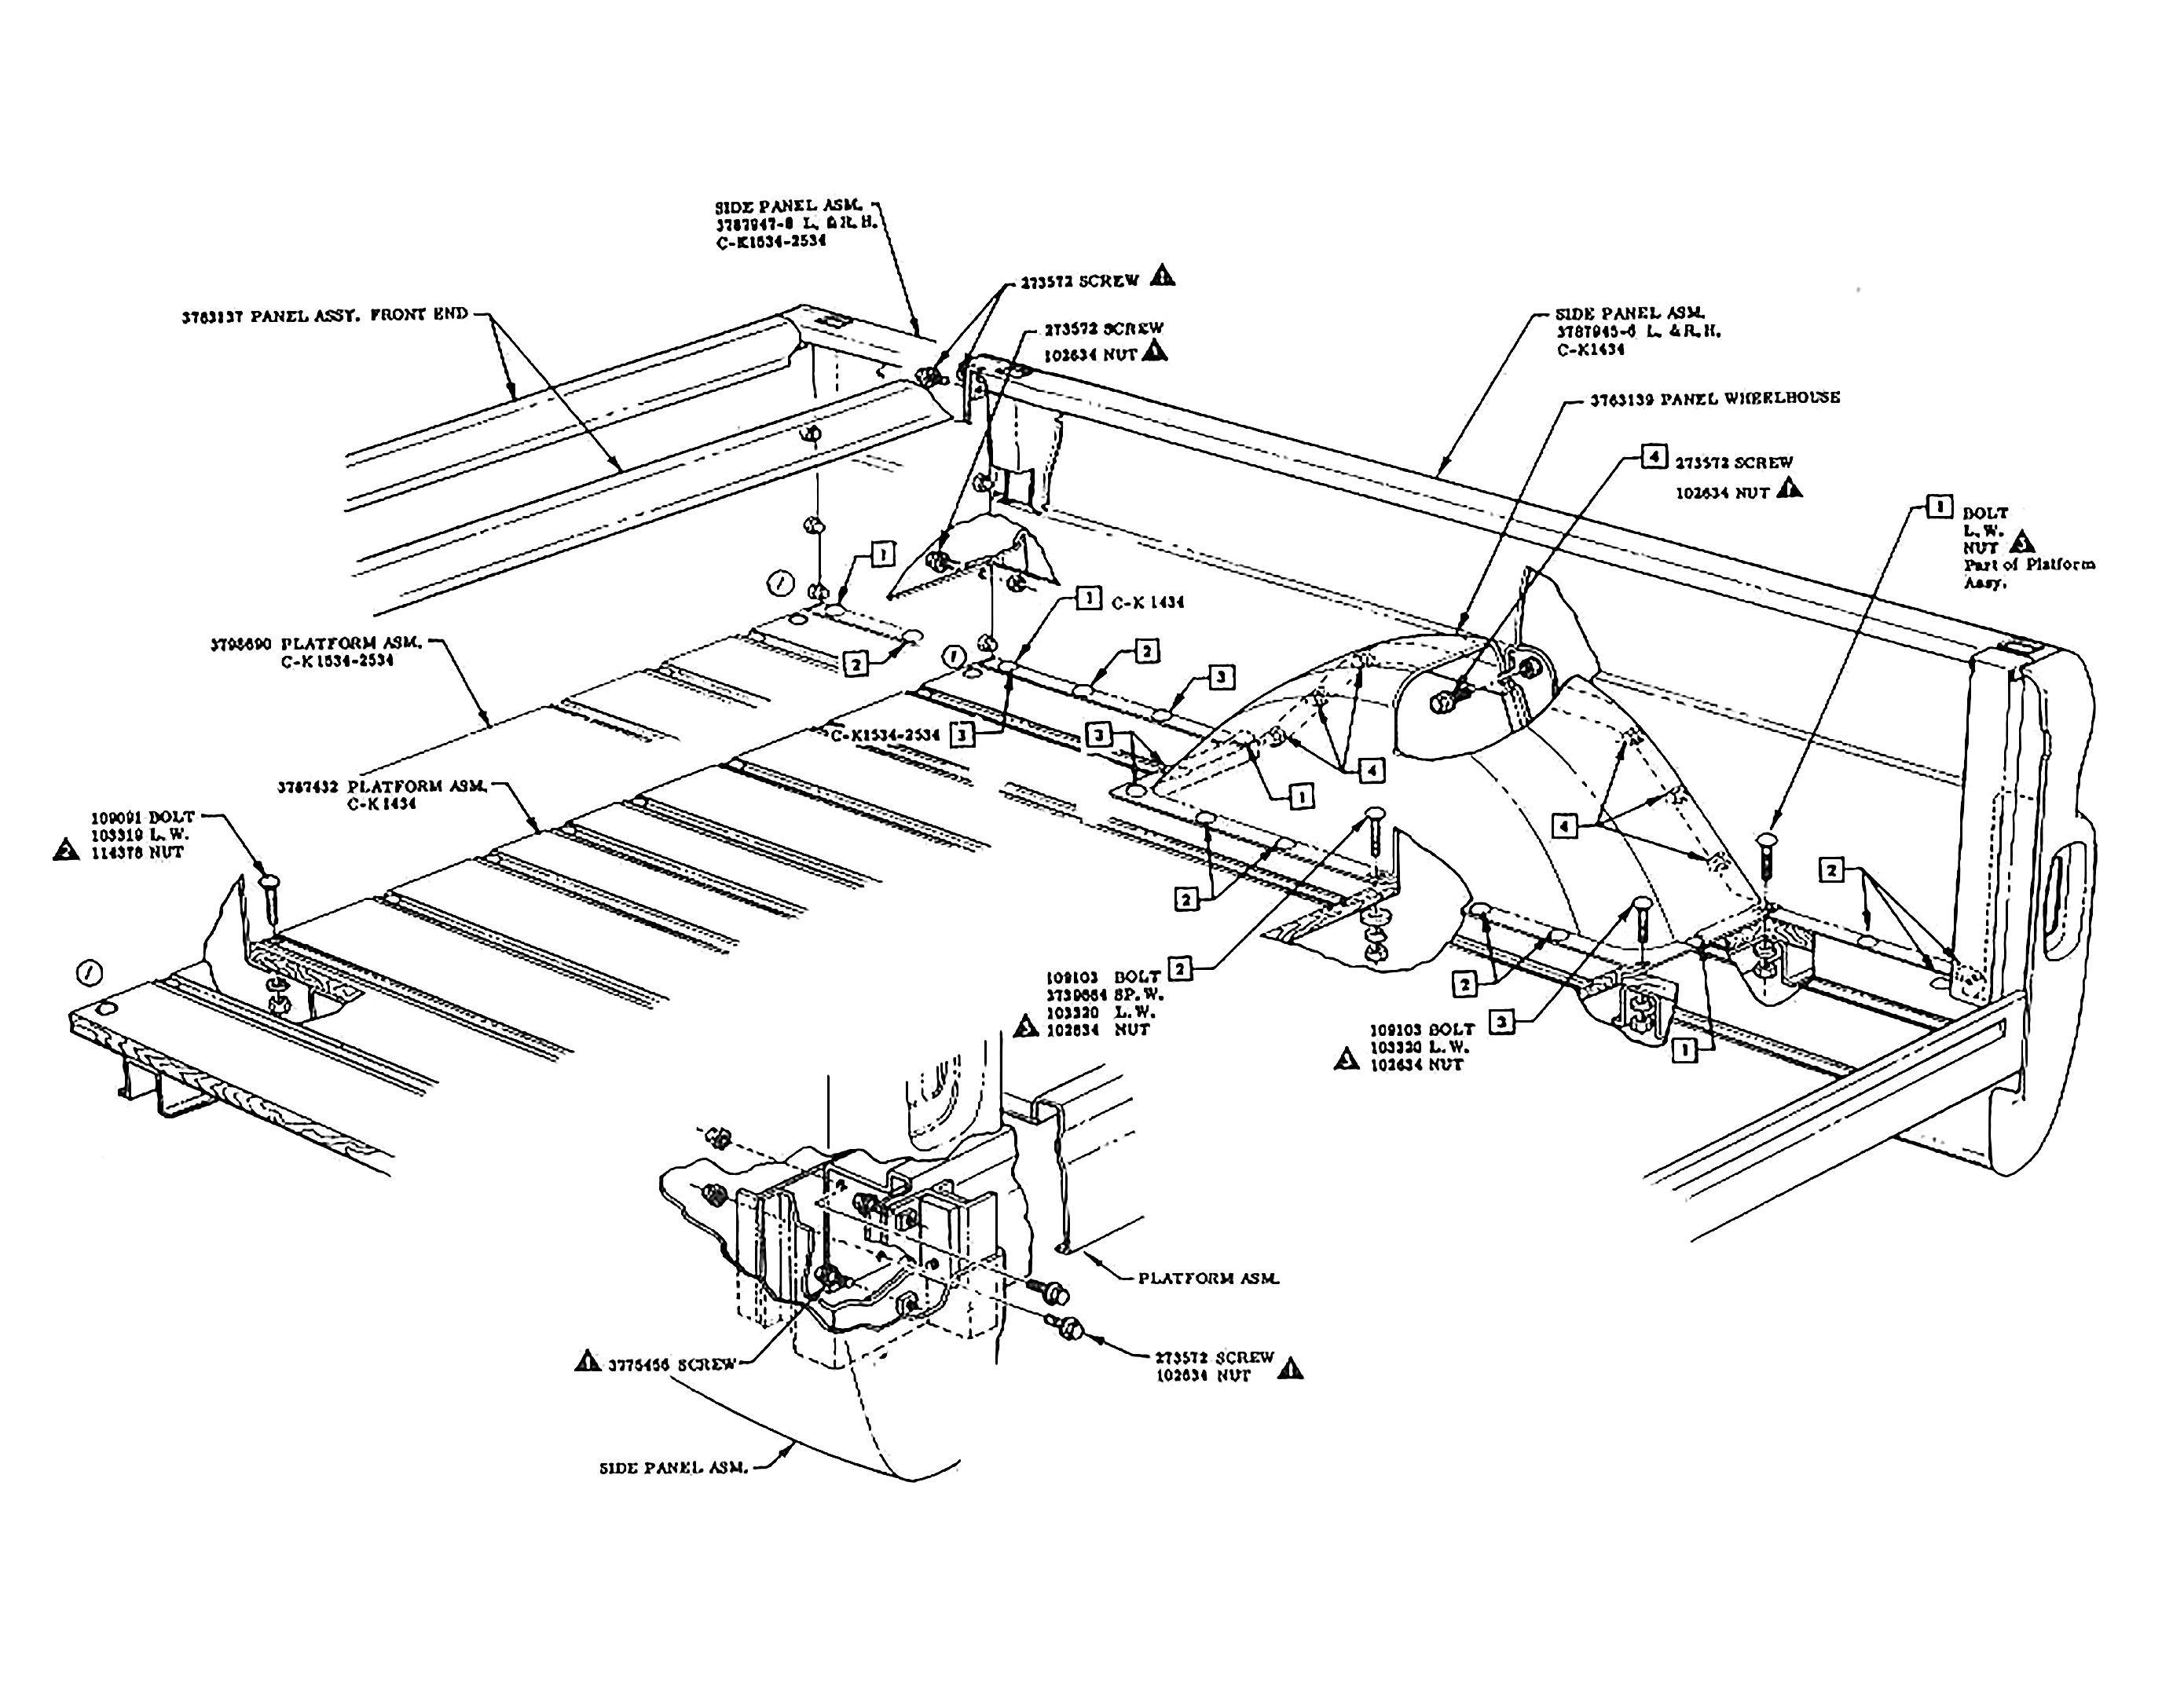 84 chevy truck wiring diagram renault master 2005 c10 grill database old phantom bed fleetside 60s